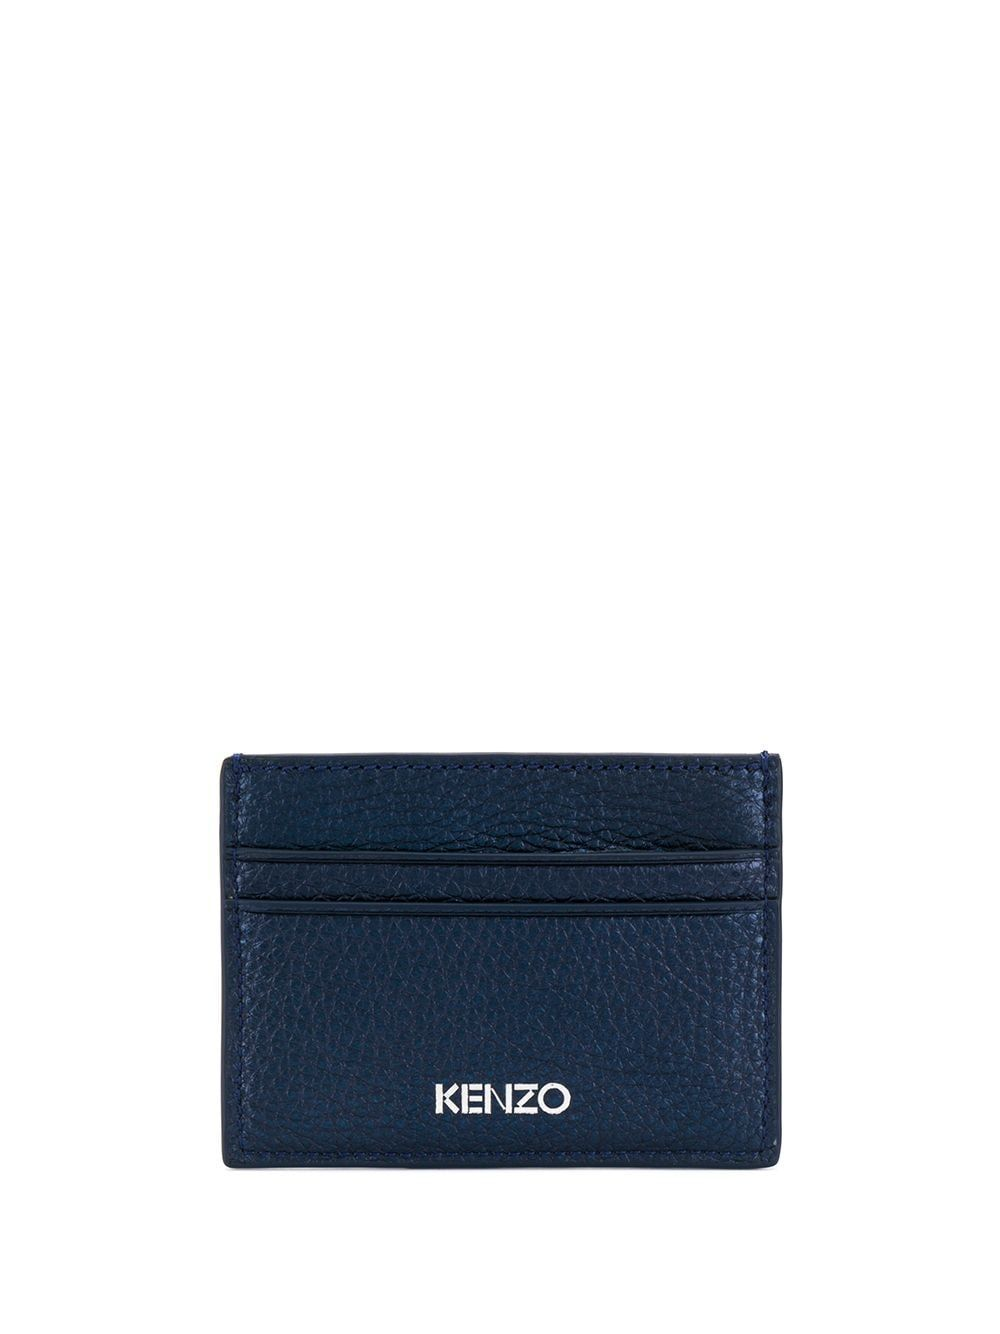 KENZO MEN'S F962PM600LP176 BLUE LEATHER CARD HOLDER